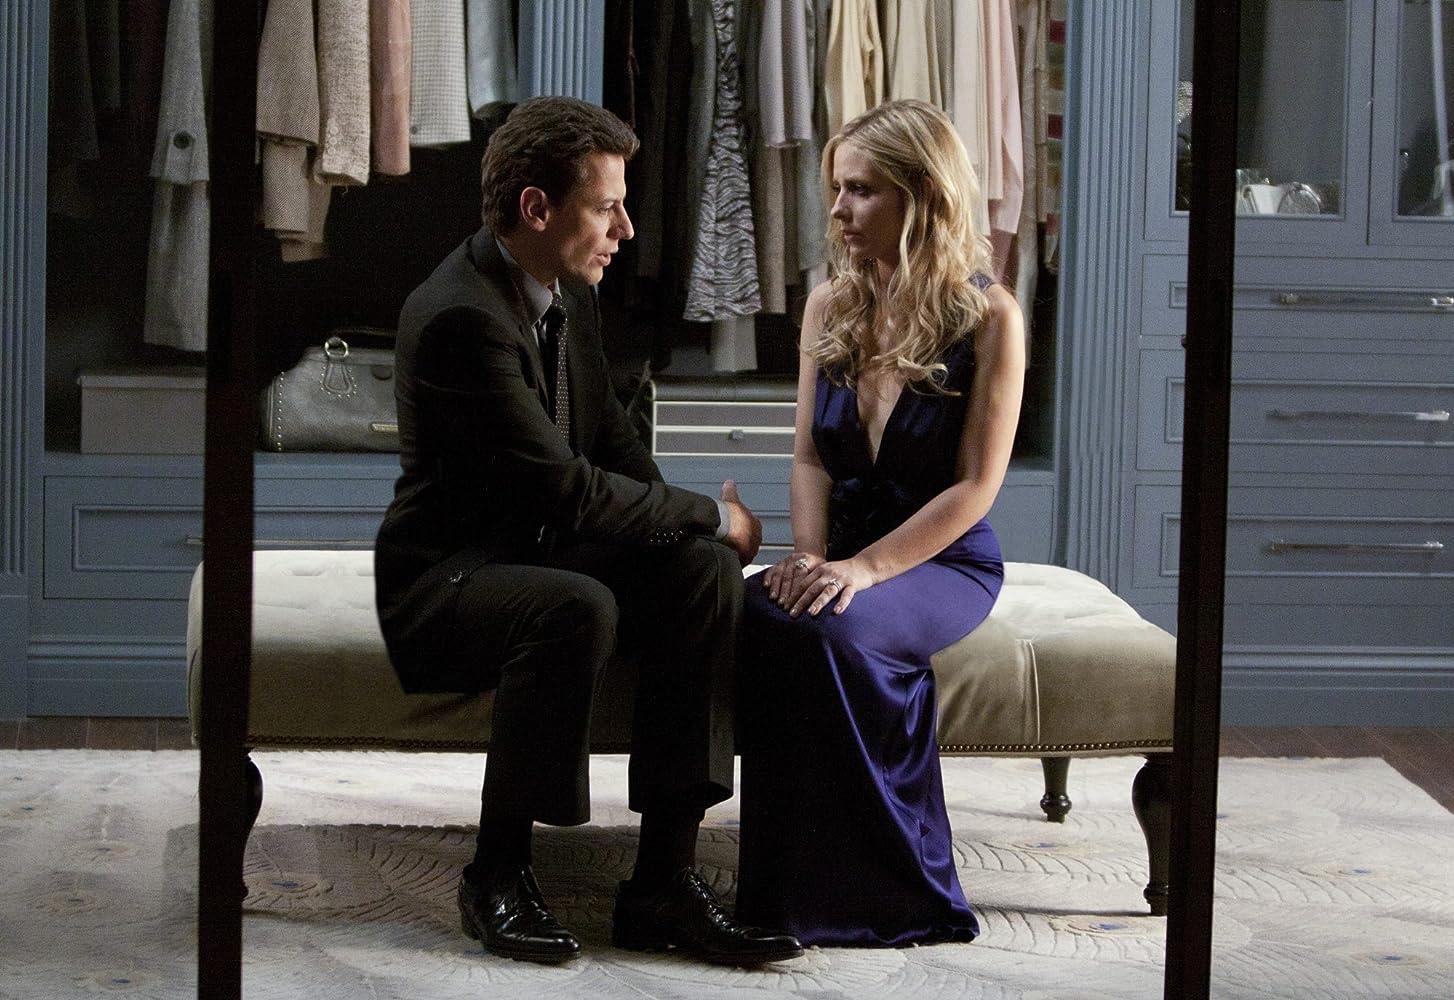 Sarah Michelle Gellar and Ioan Gruffudd in Ringer (2011)